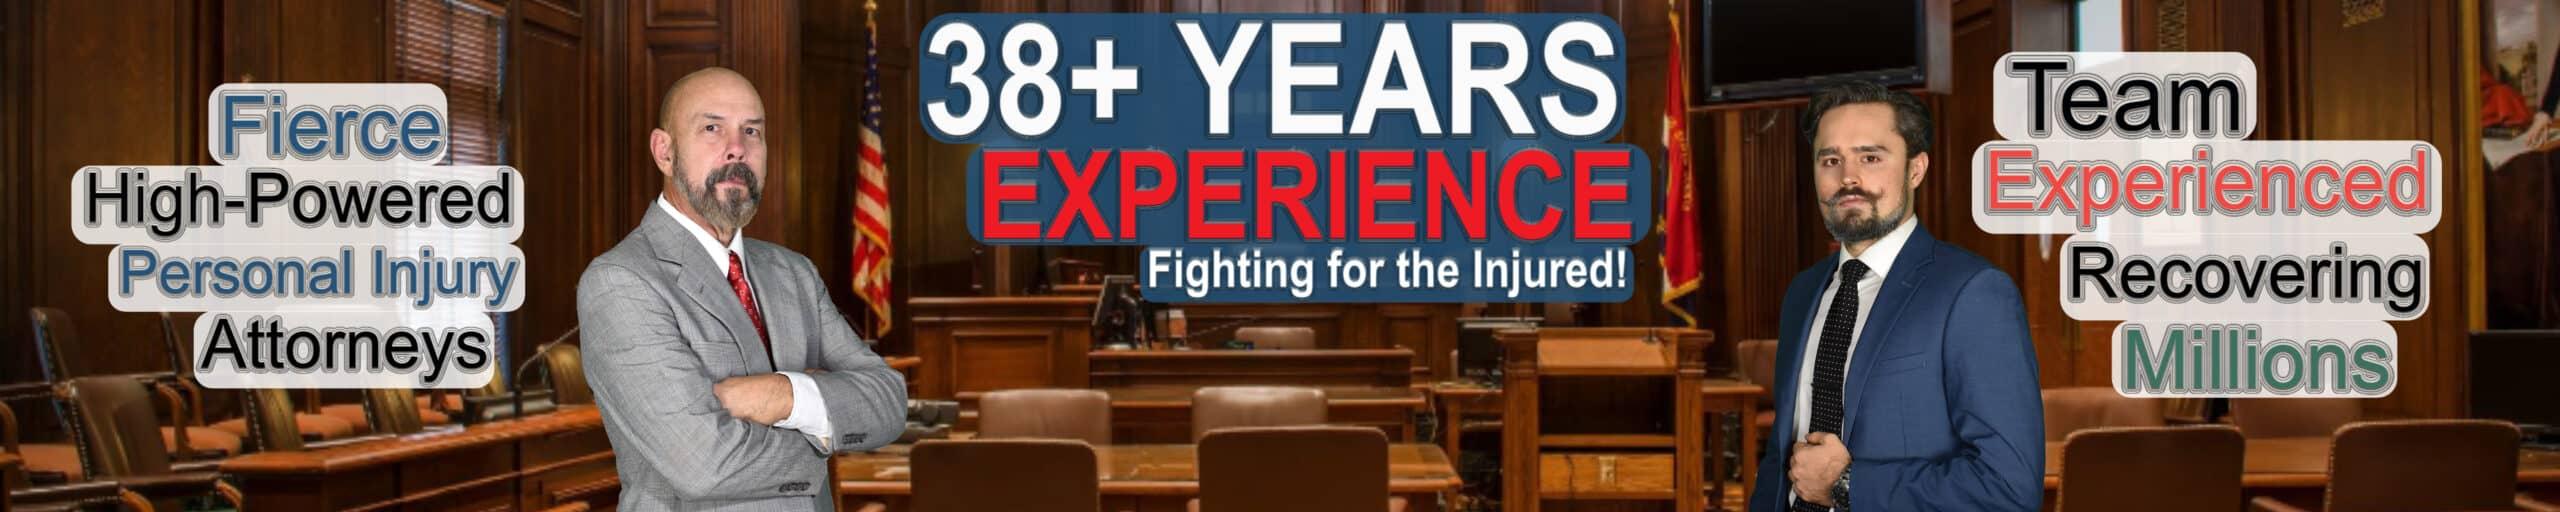 Decatur-Georgia-Damages-Personal-Injury-Attorney-Lawyer-Hurt-Injured-Damages-Hospital-Car-Accident-Broken-Best-Merck-Law